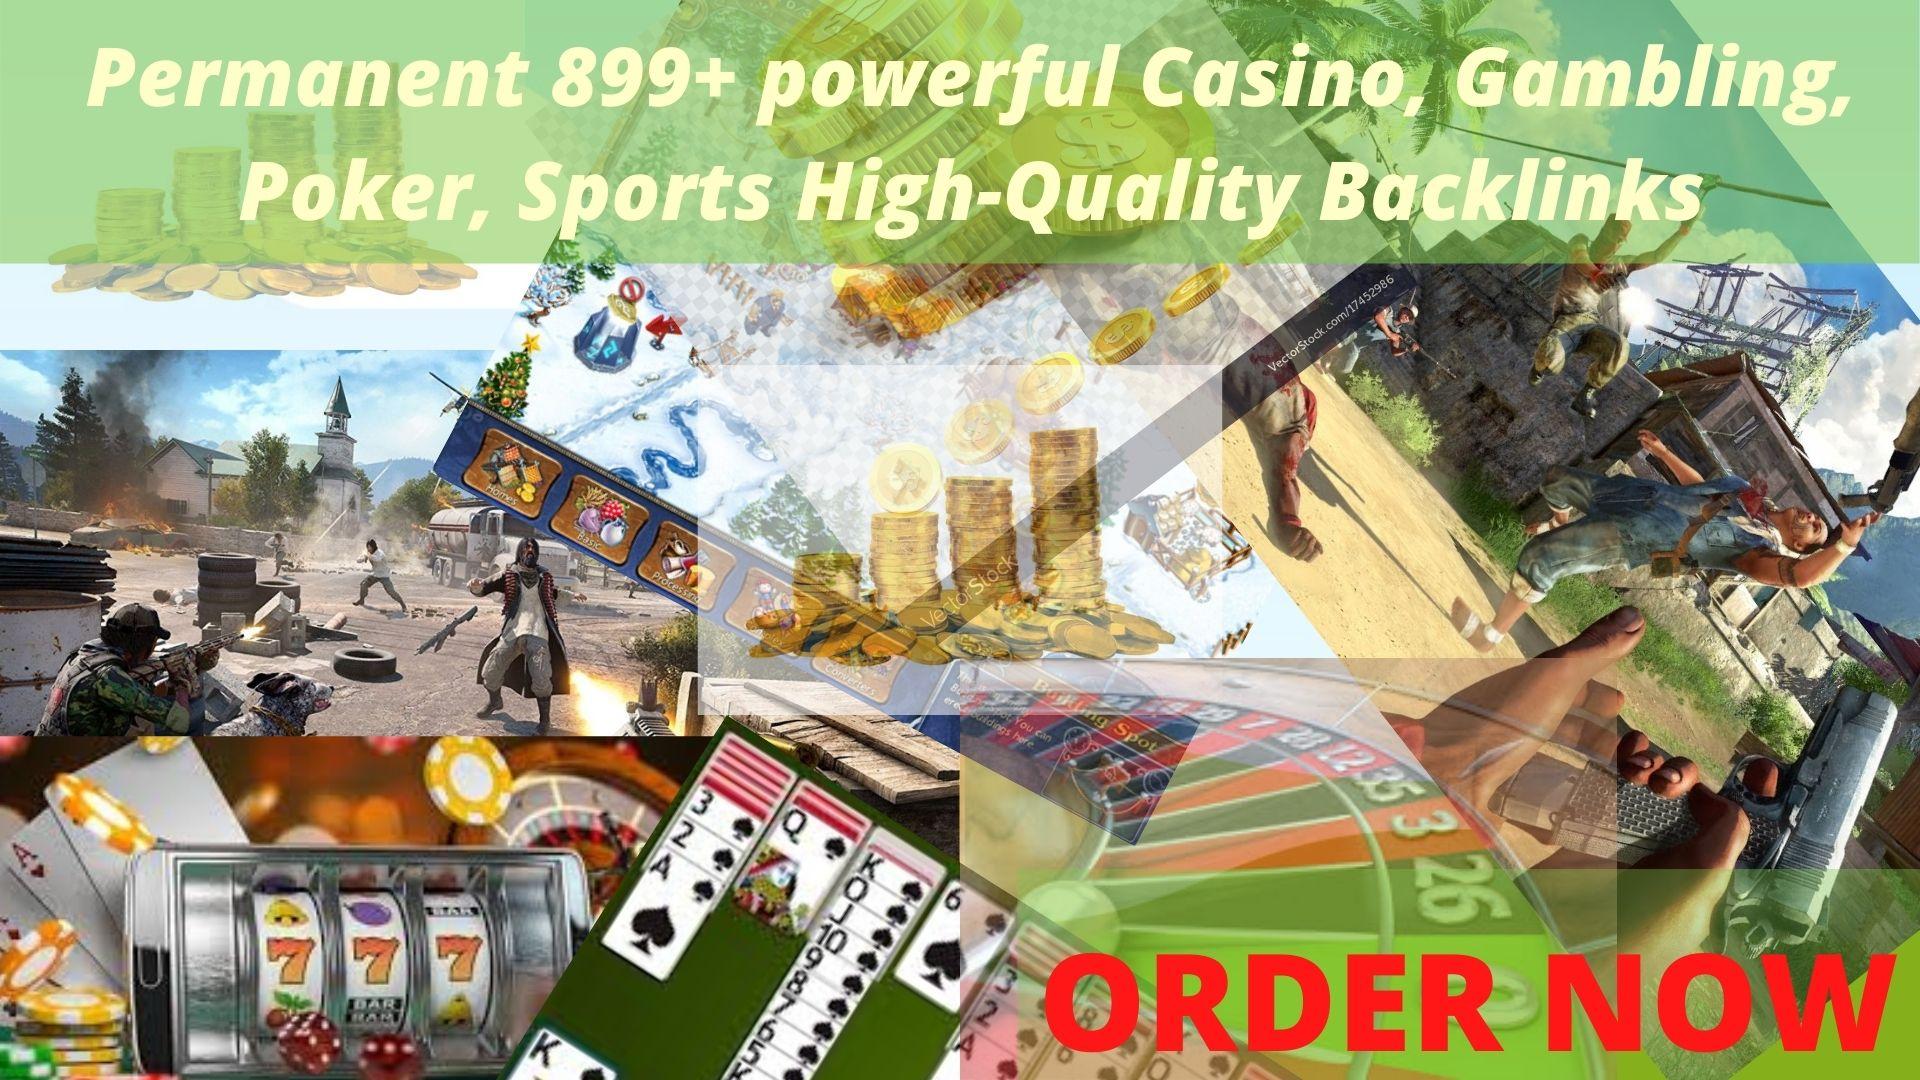 Get powerful Permanent 899+ powerful Casino,  Gambling,  Poker,  Sports High-Quality Backlinks.